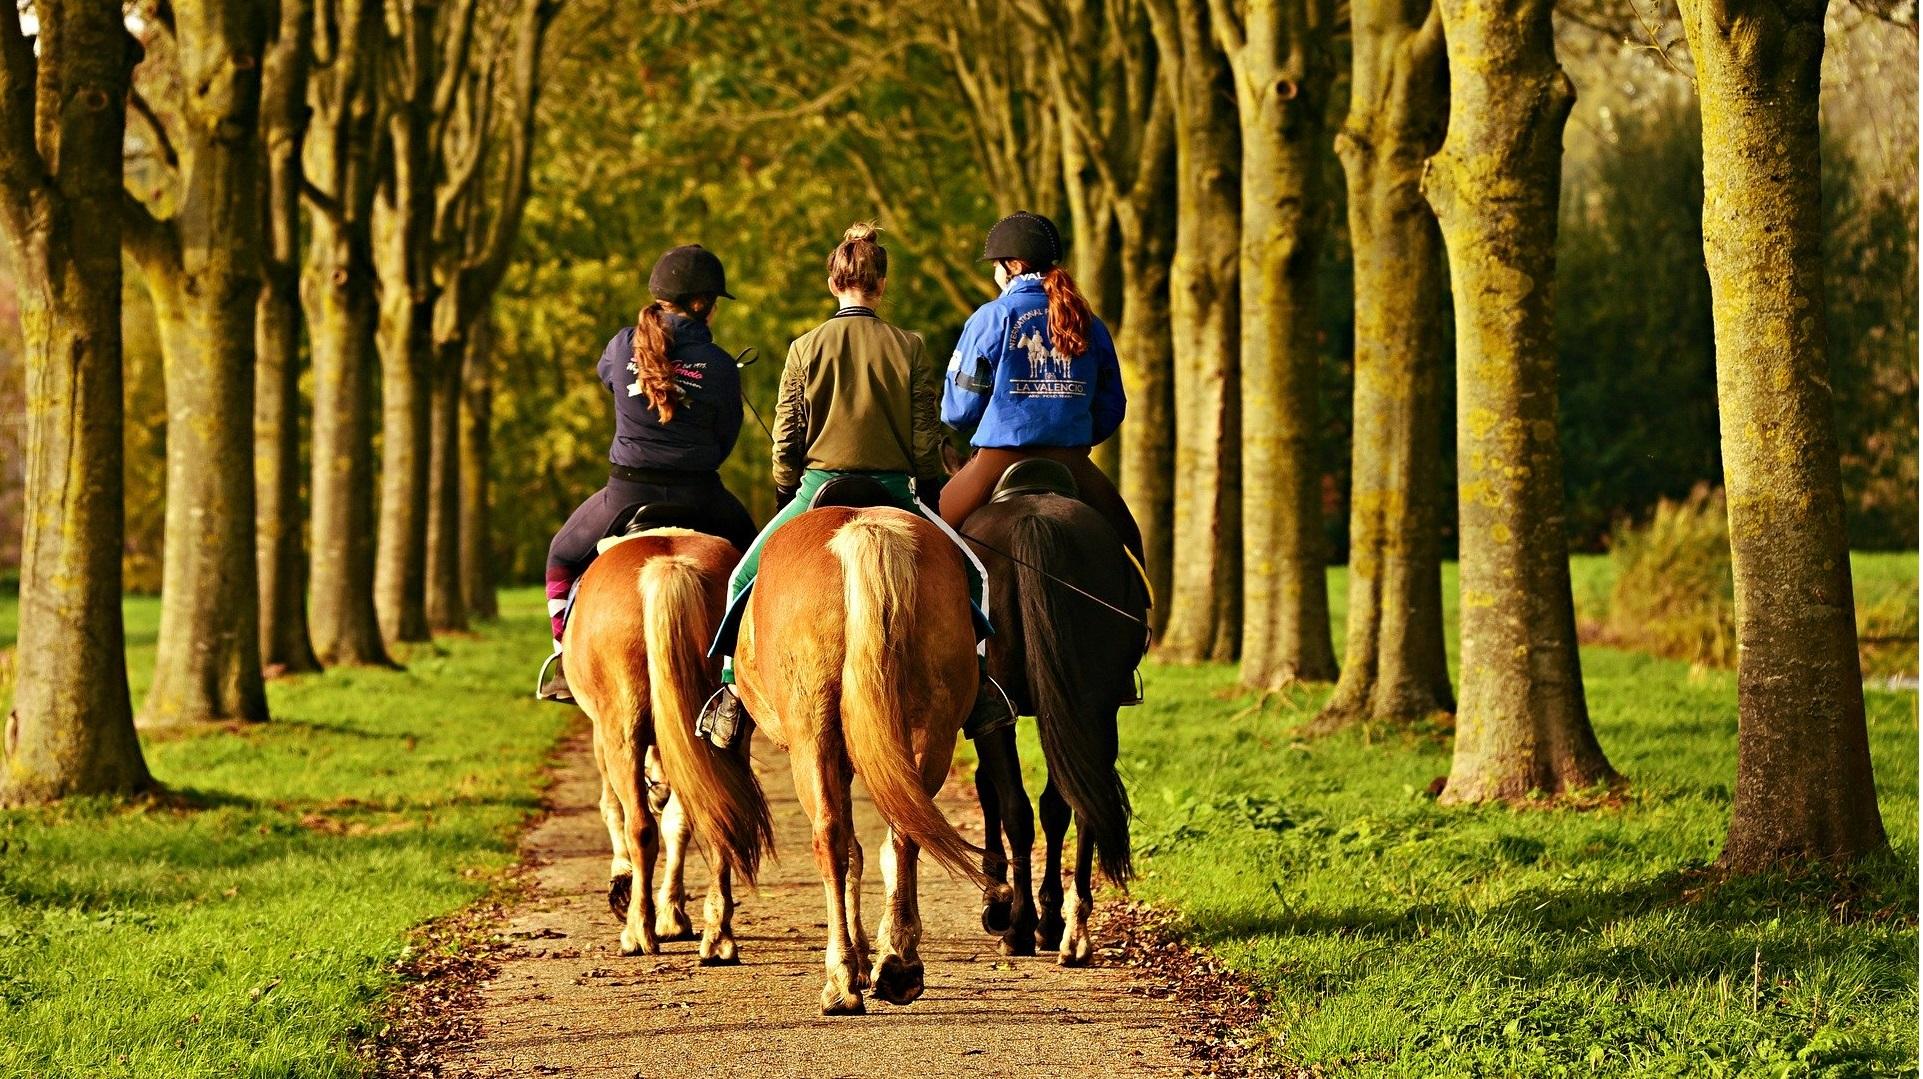 horse-rider-3807396_1920